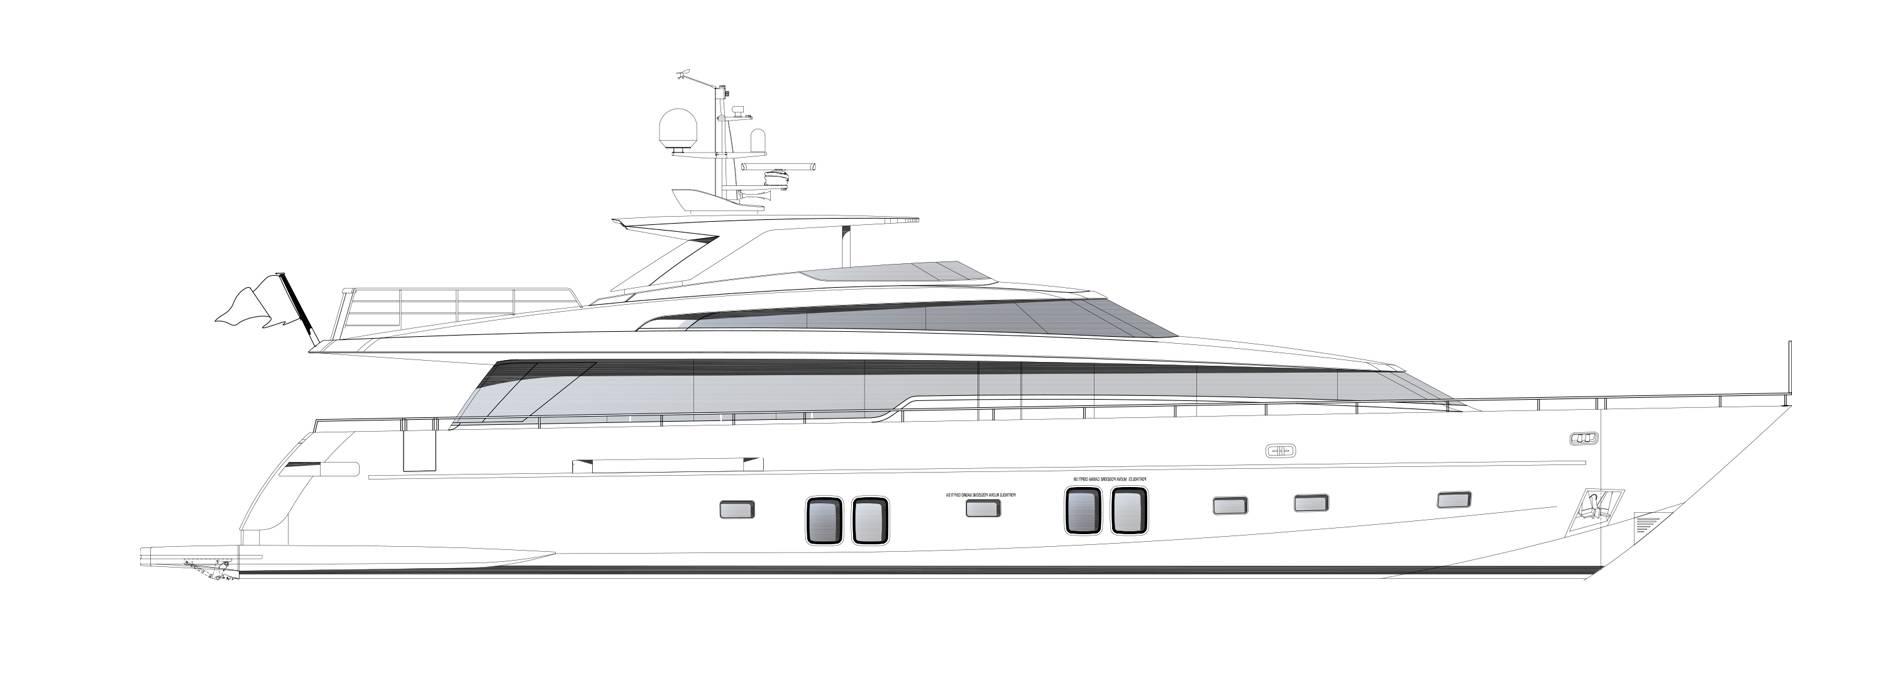 Sanlorenzo Yachts SL96-684 Profile